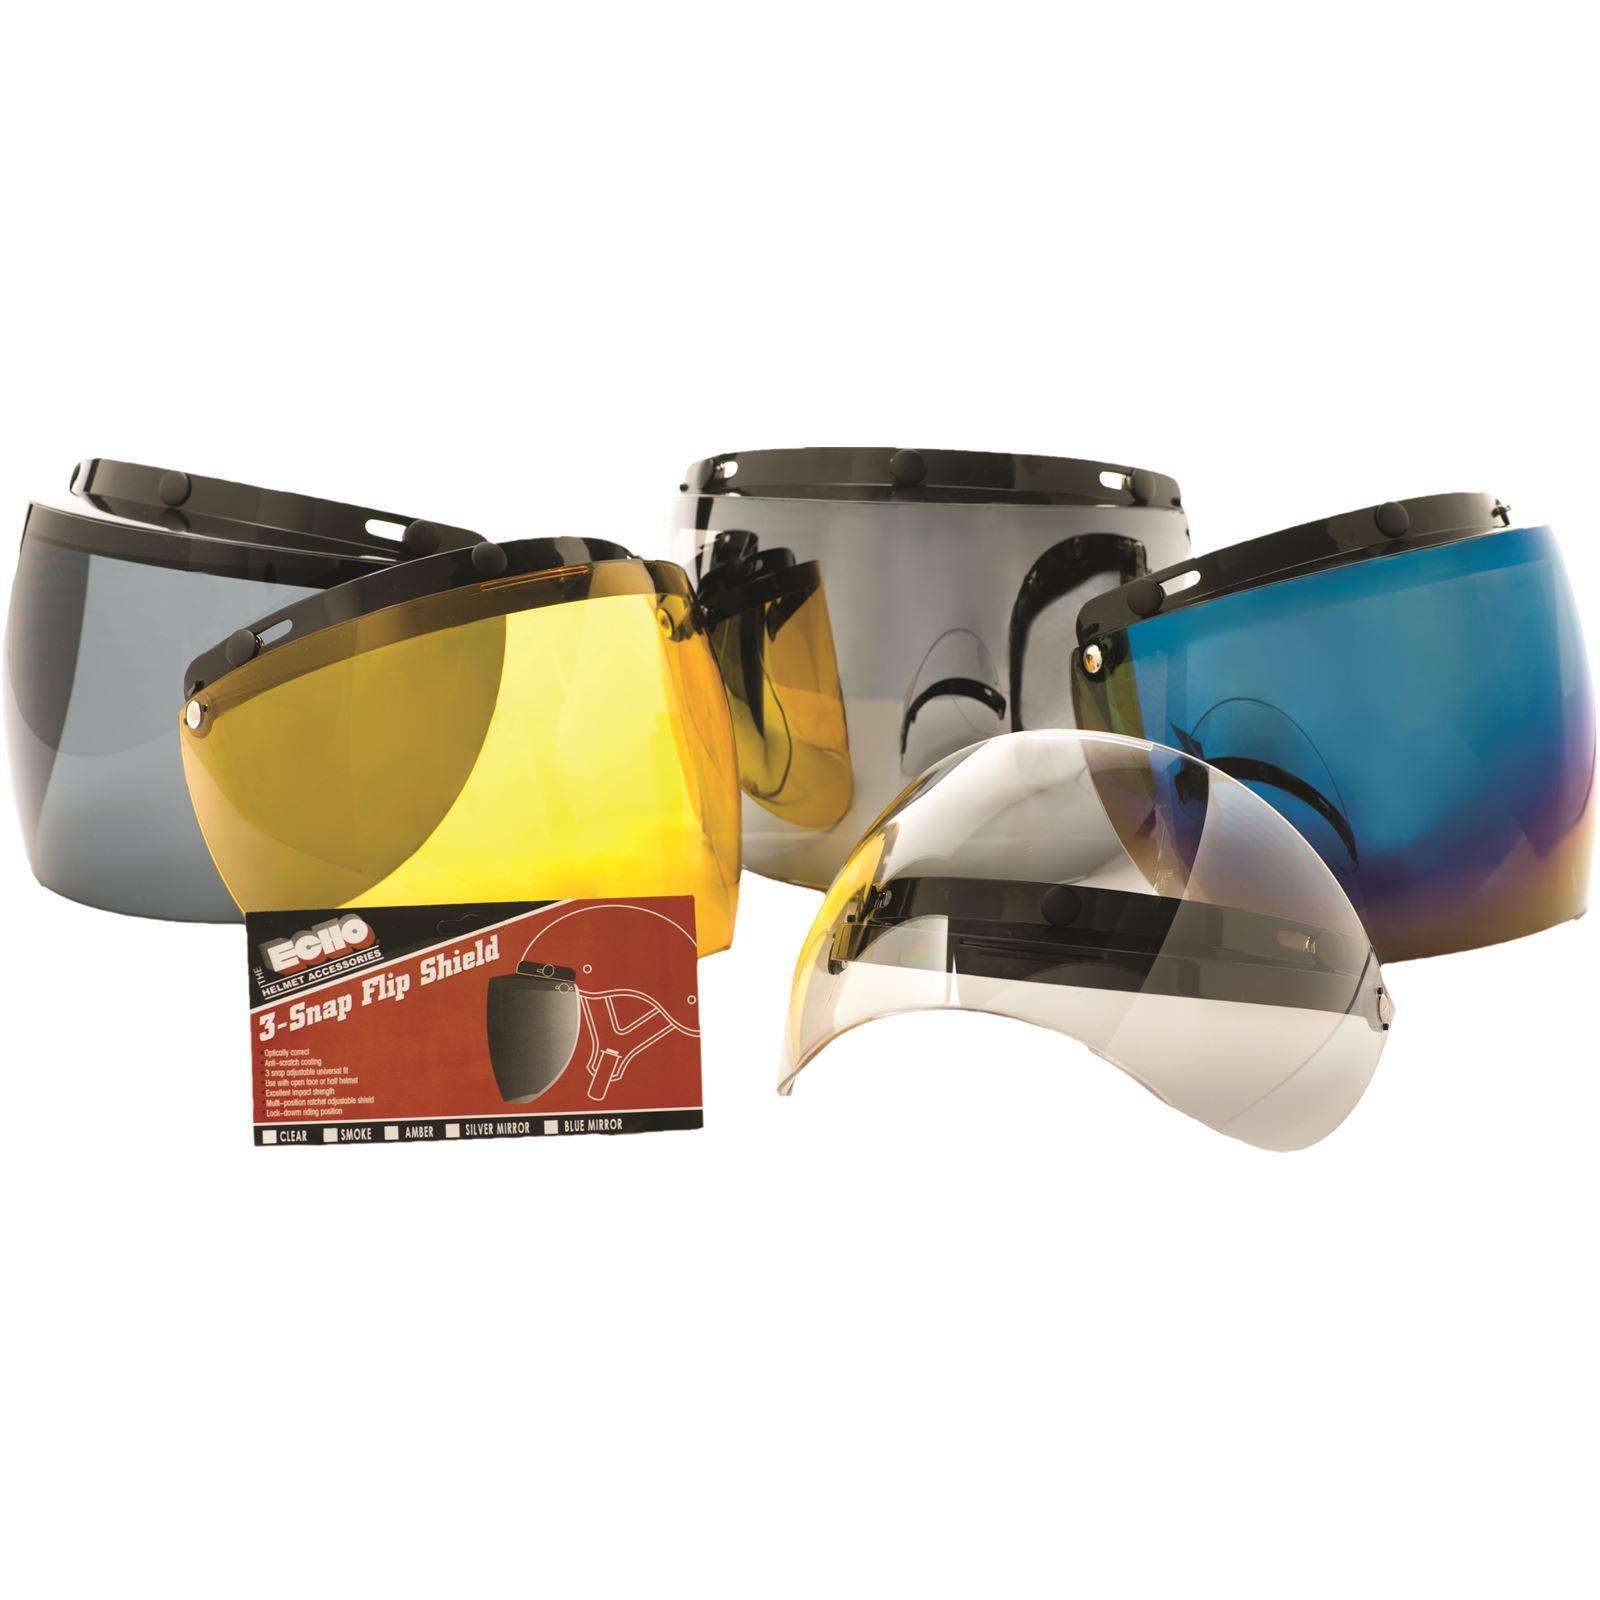 Echo 3-Snap Flip Shield